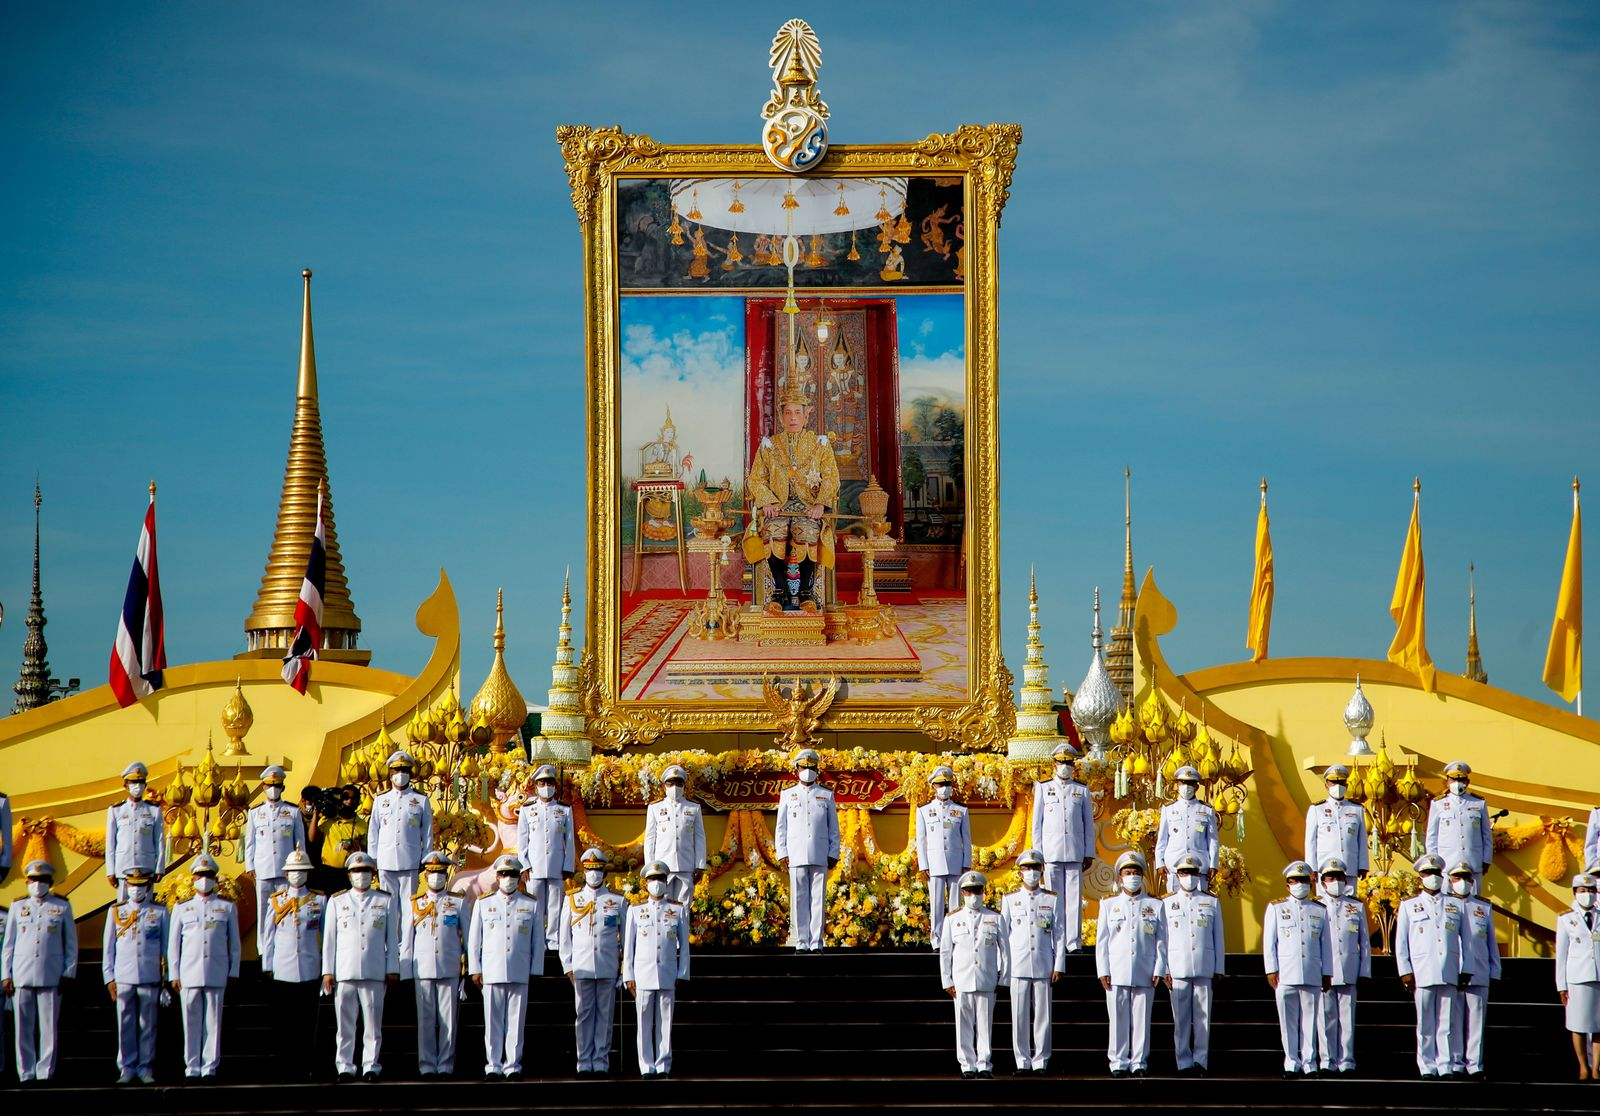 King Maha Vajiralongkorn Bodindradebayavarangkun celerbrates birthday, Bangkok, Thailand - 28 Jul 2020